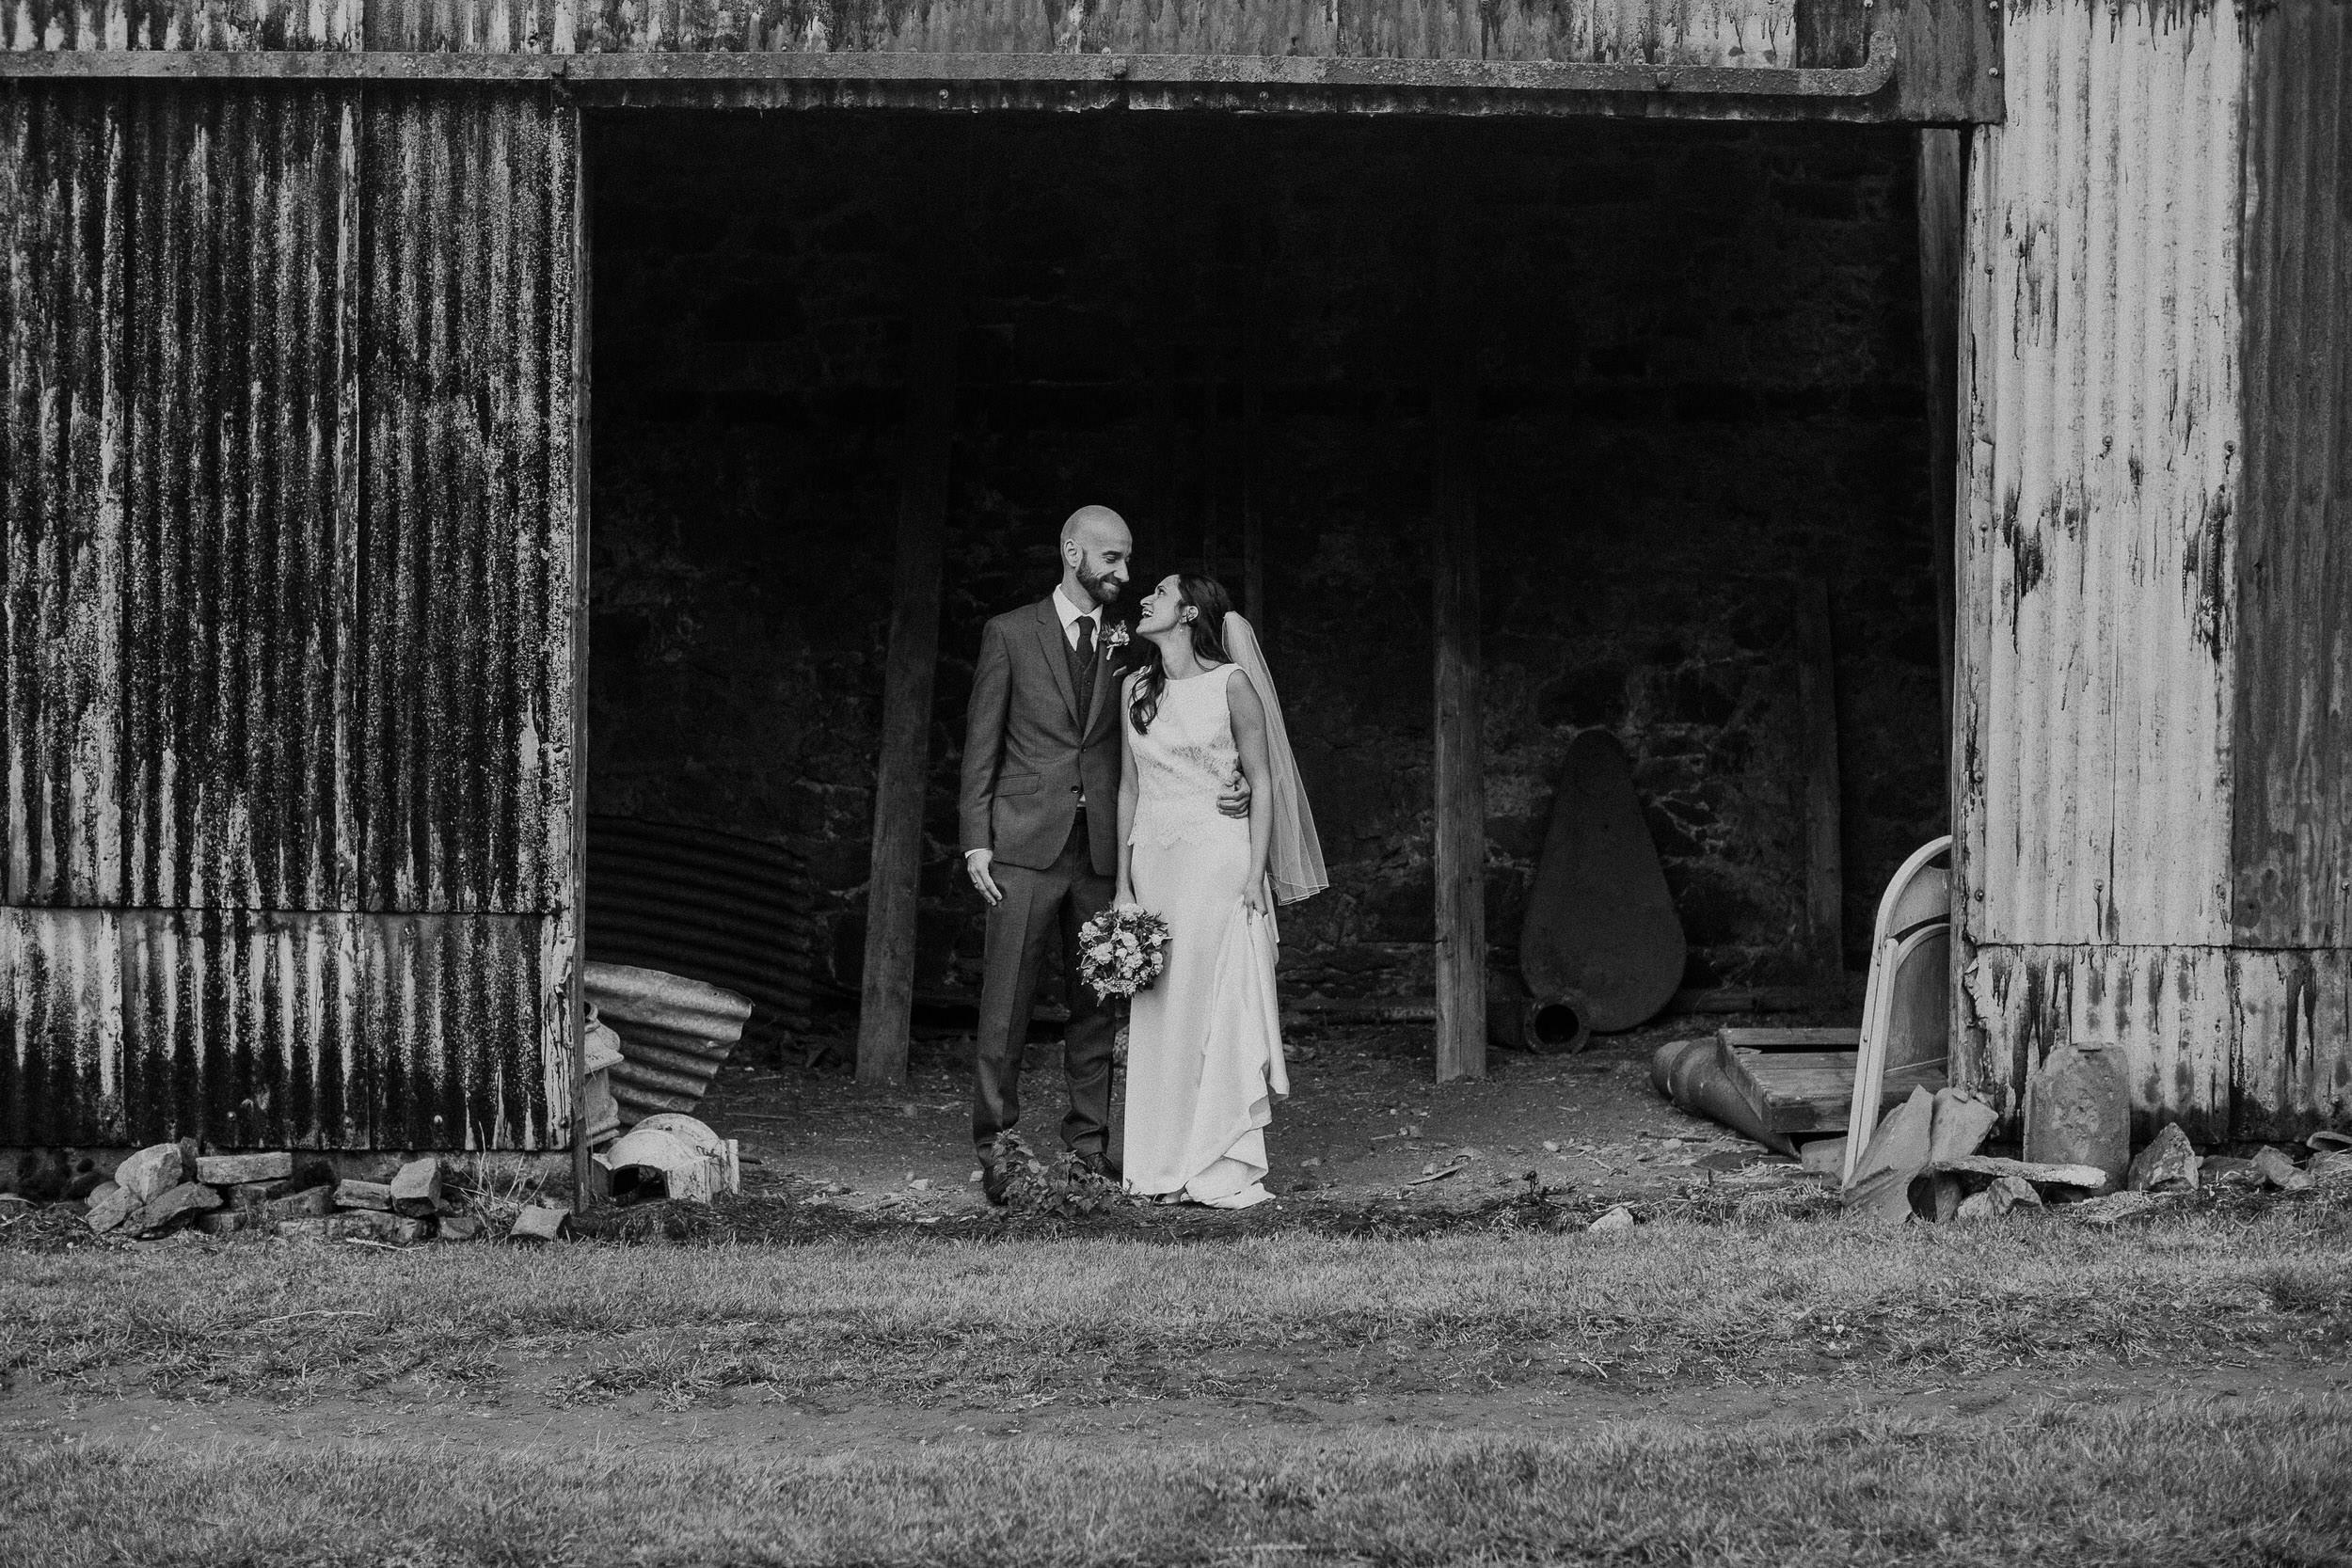 Quirky Wedding Photographer Scotland Glasgow Edinburgh Mirrorbox 161.jpg